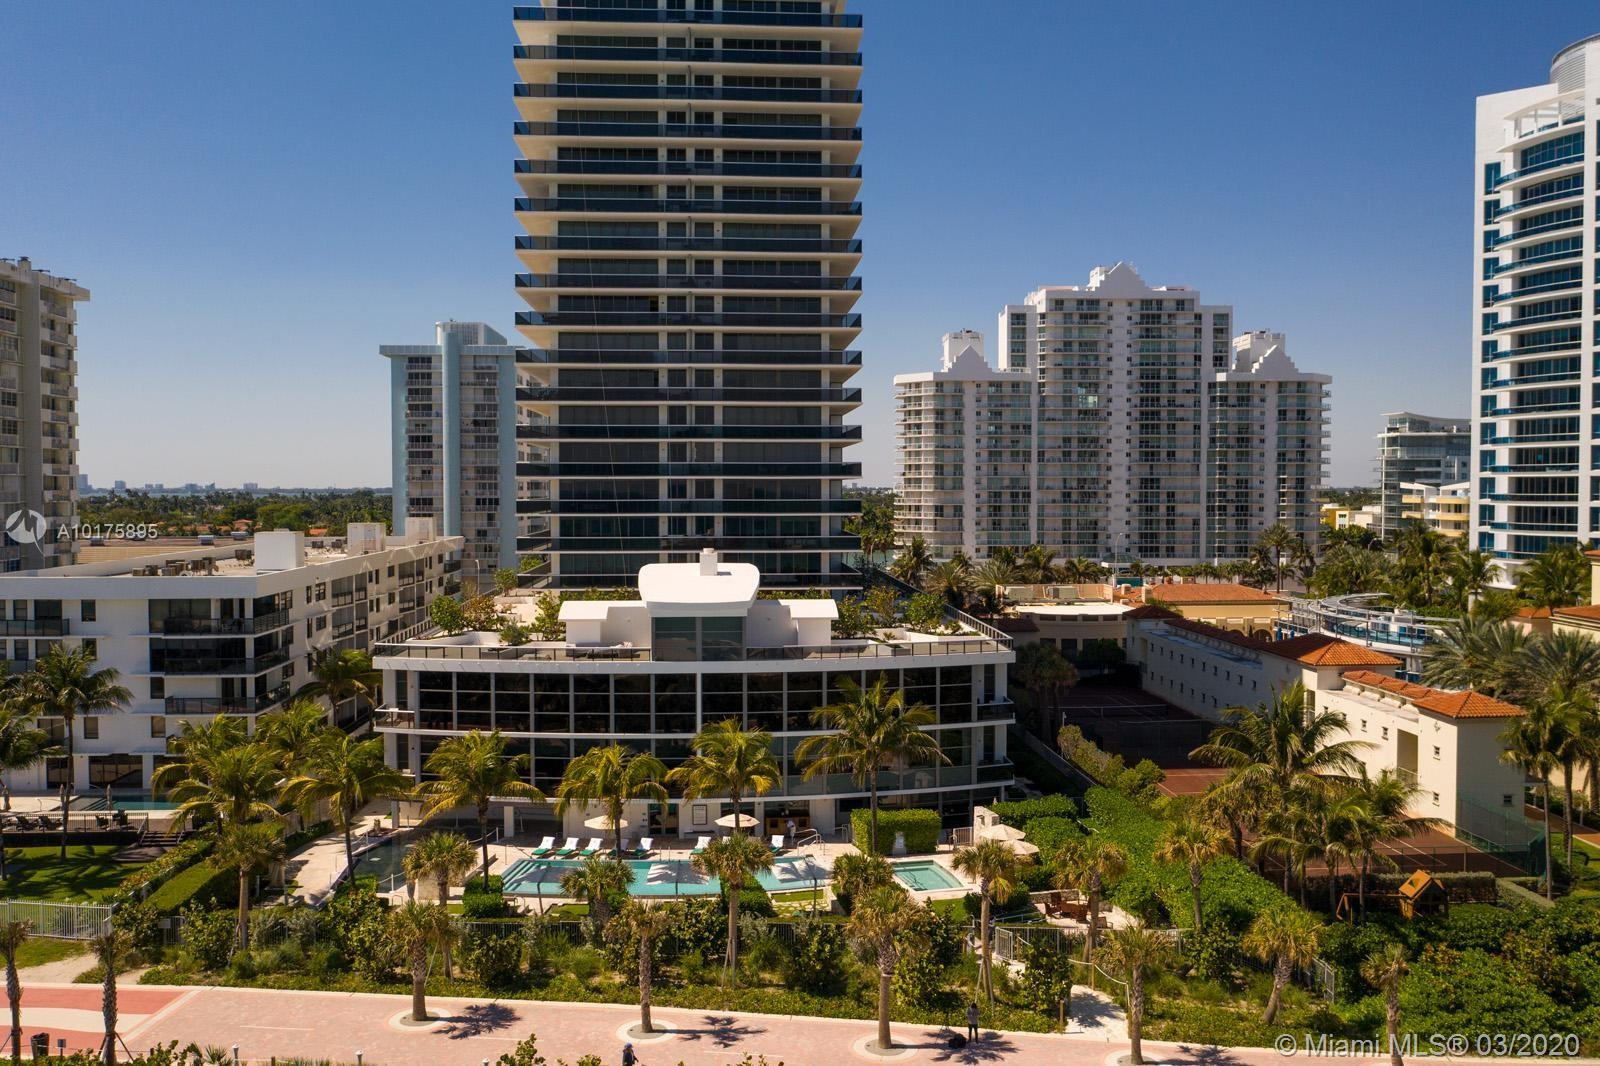 MEi Miami Beach #905 - 5875 COLLINS AV #905, Miami Beach, FL 33140